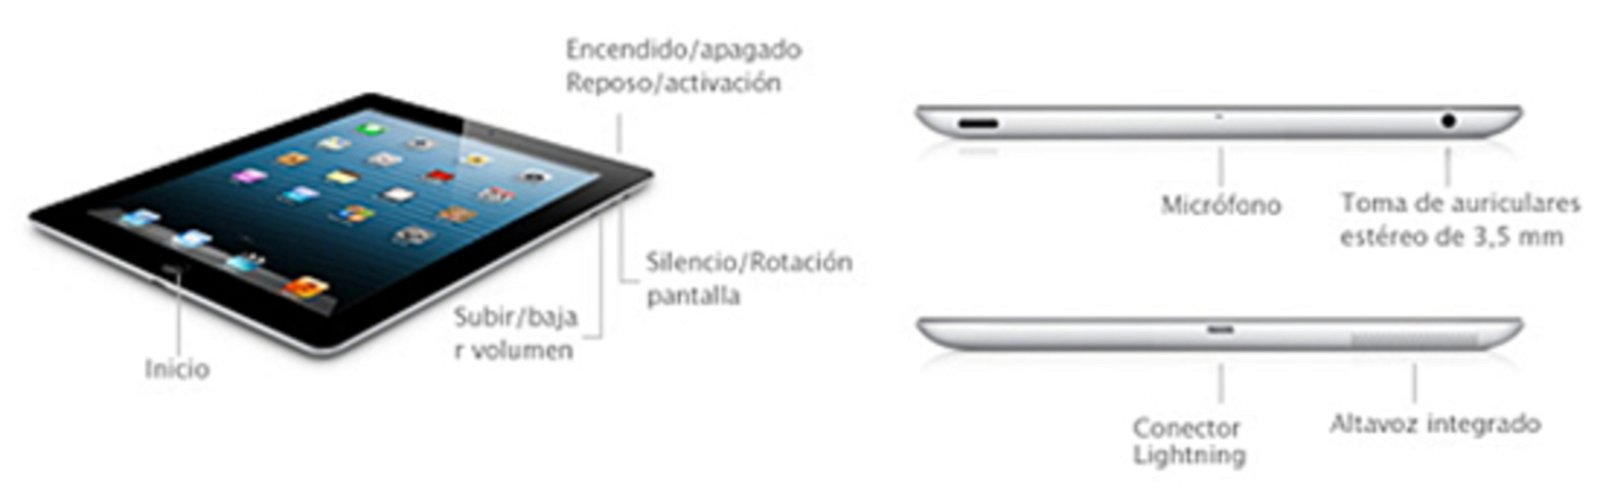 identificar-modelo-ipad-10